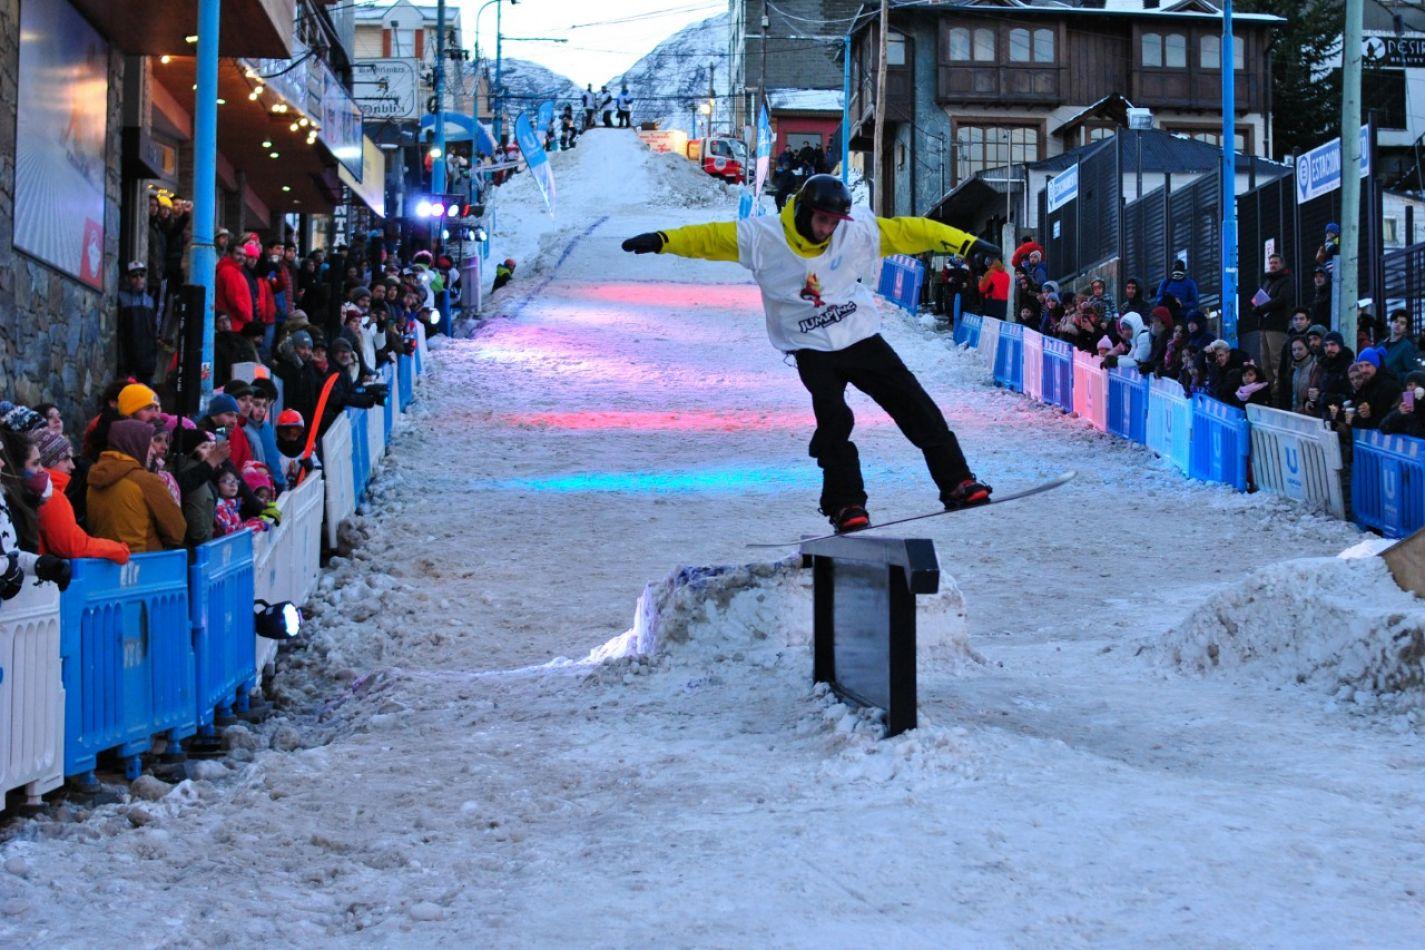 Jornada  de jumping x freestyle en el centro de Ushuaia